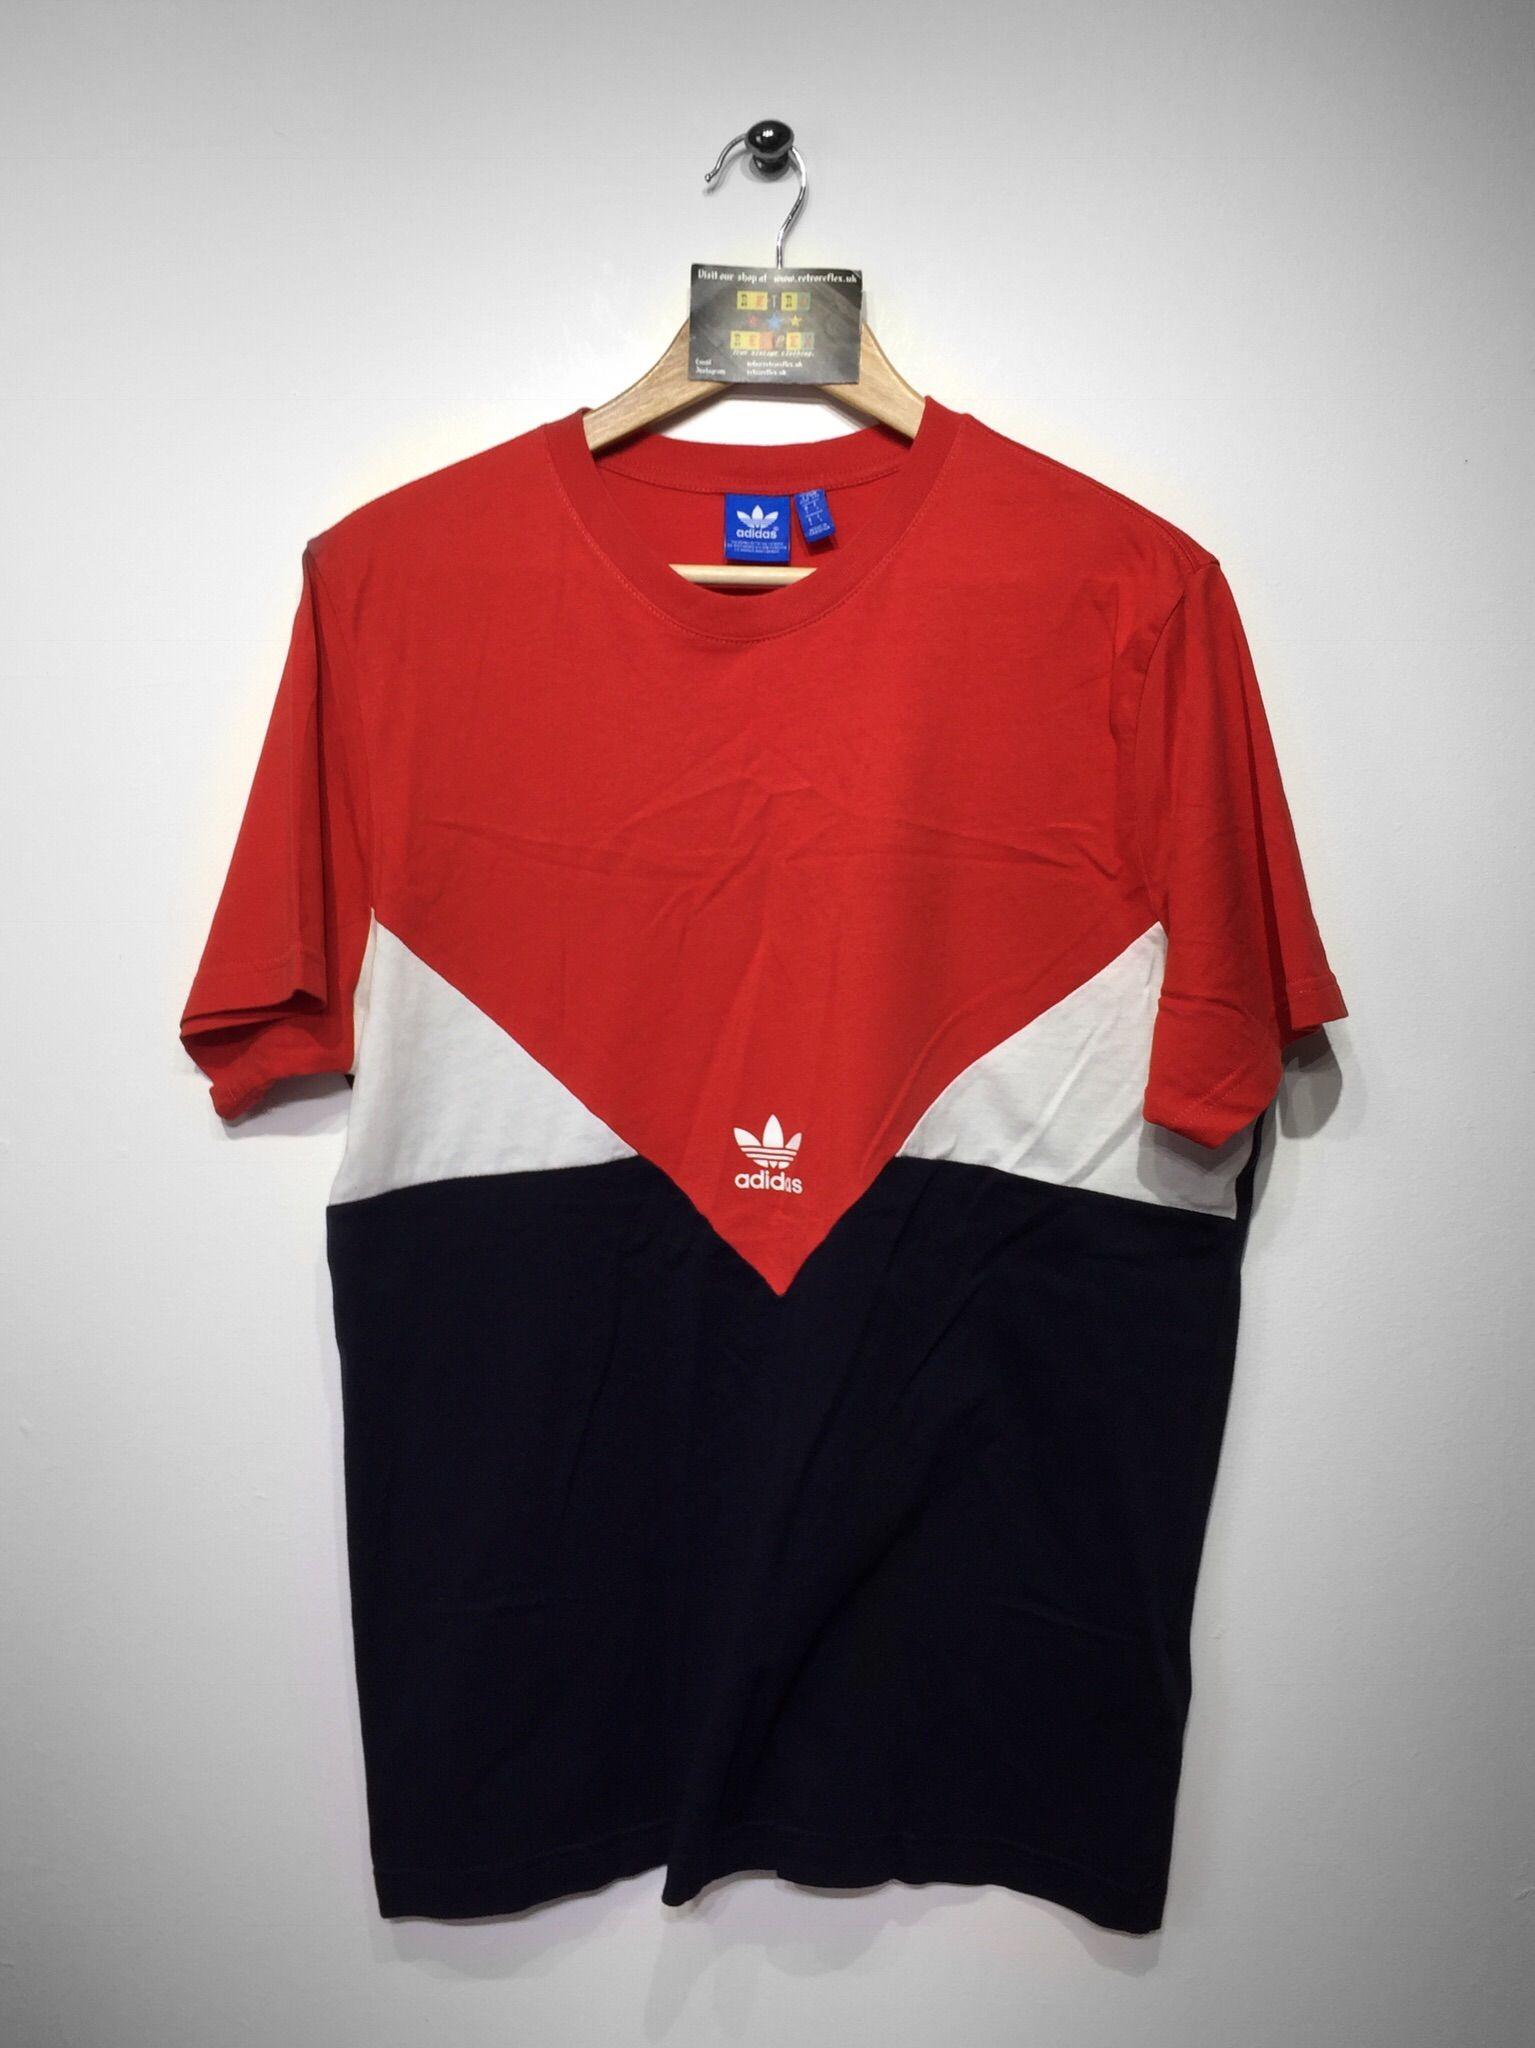 old school adidas shirt